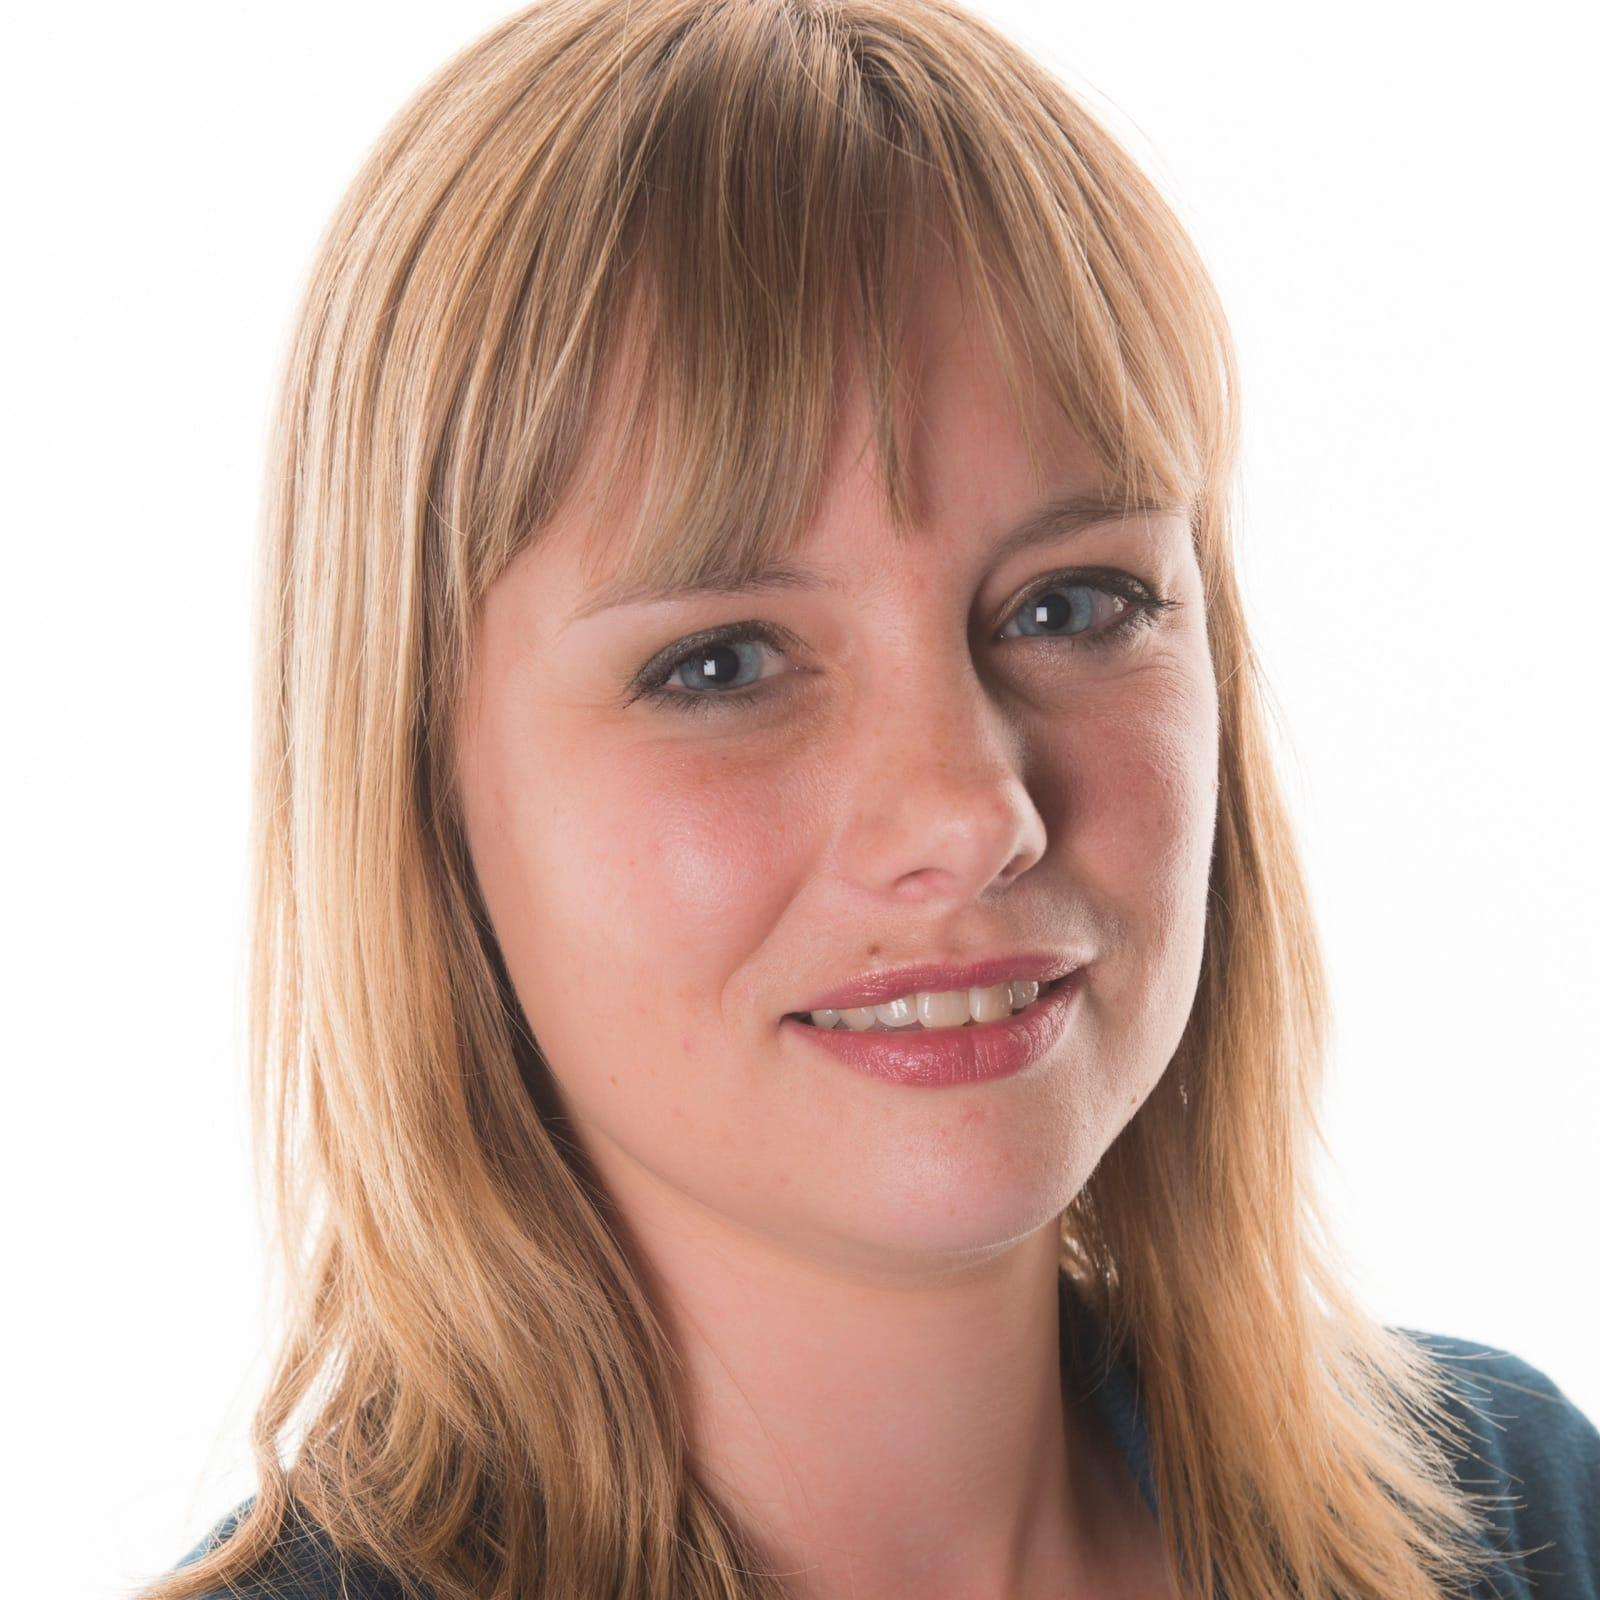 Angeline Evers - Boekhouder in Renkum